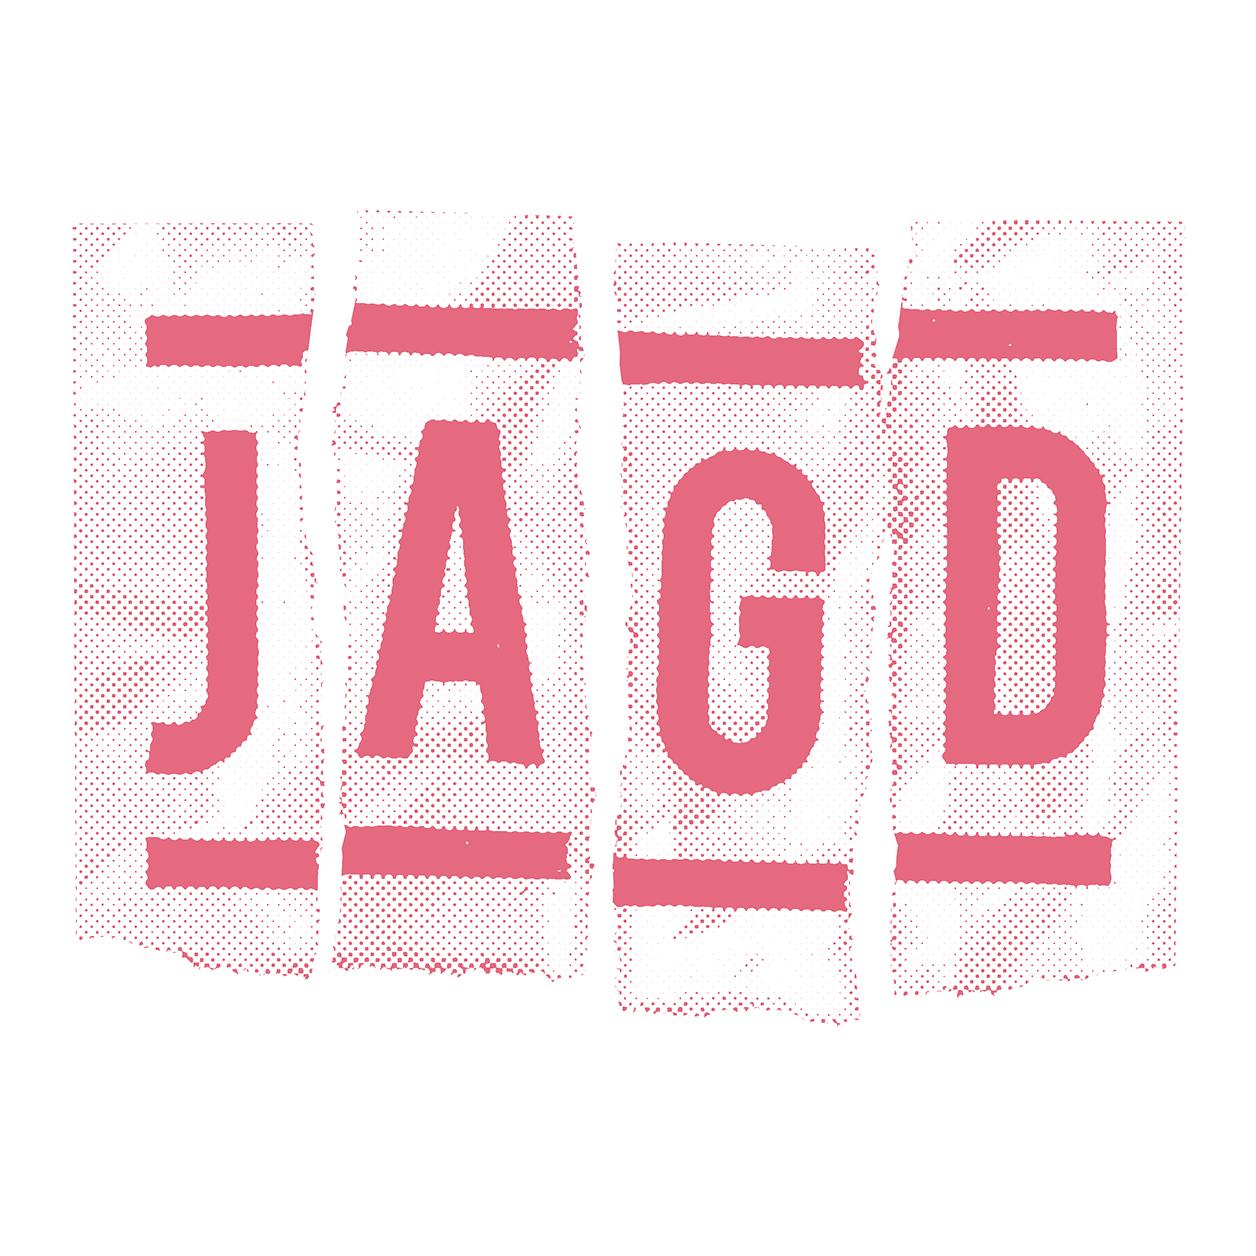 Jagd Clubtour_t-shirt wit_zoom.jpg